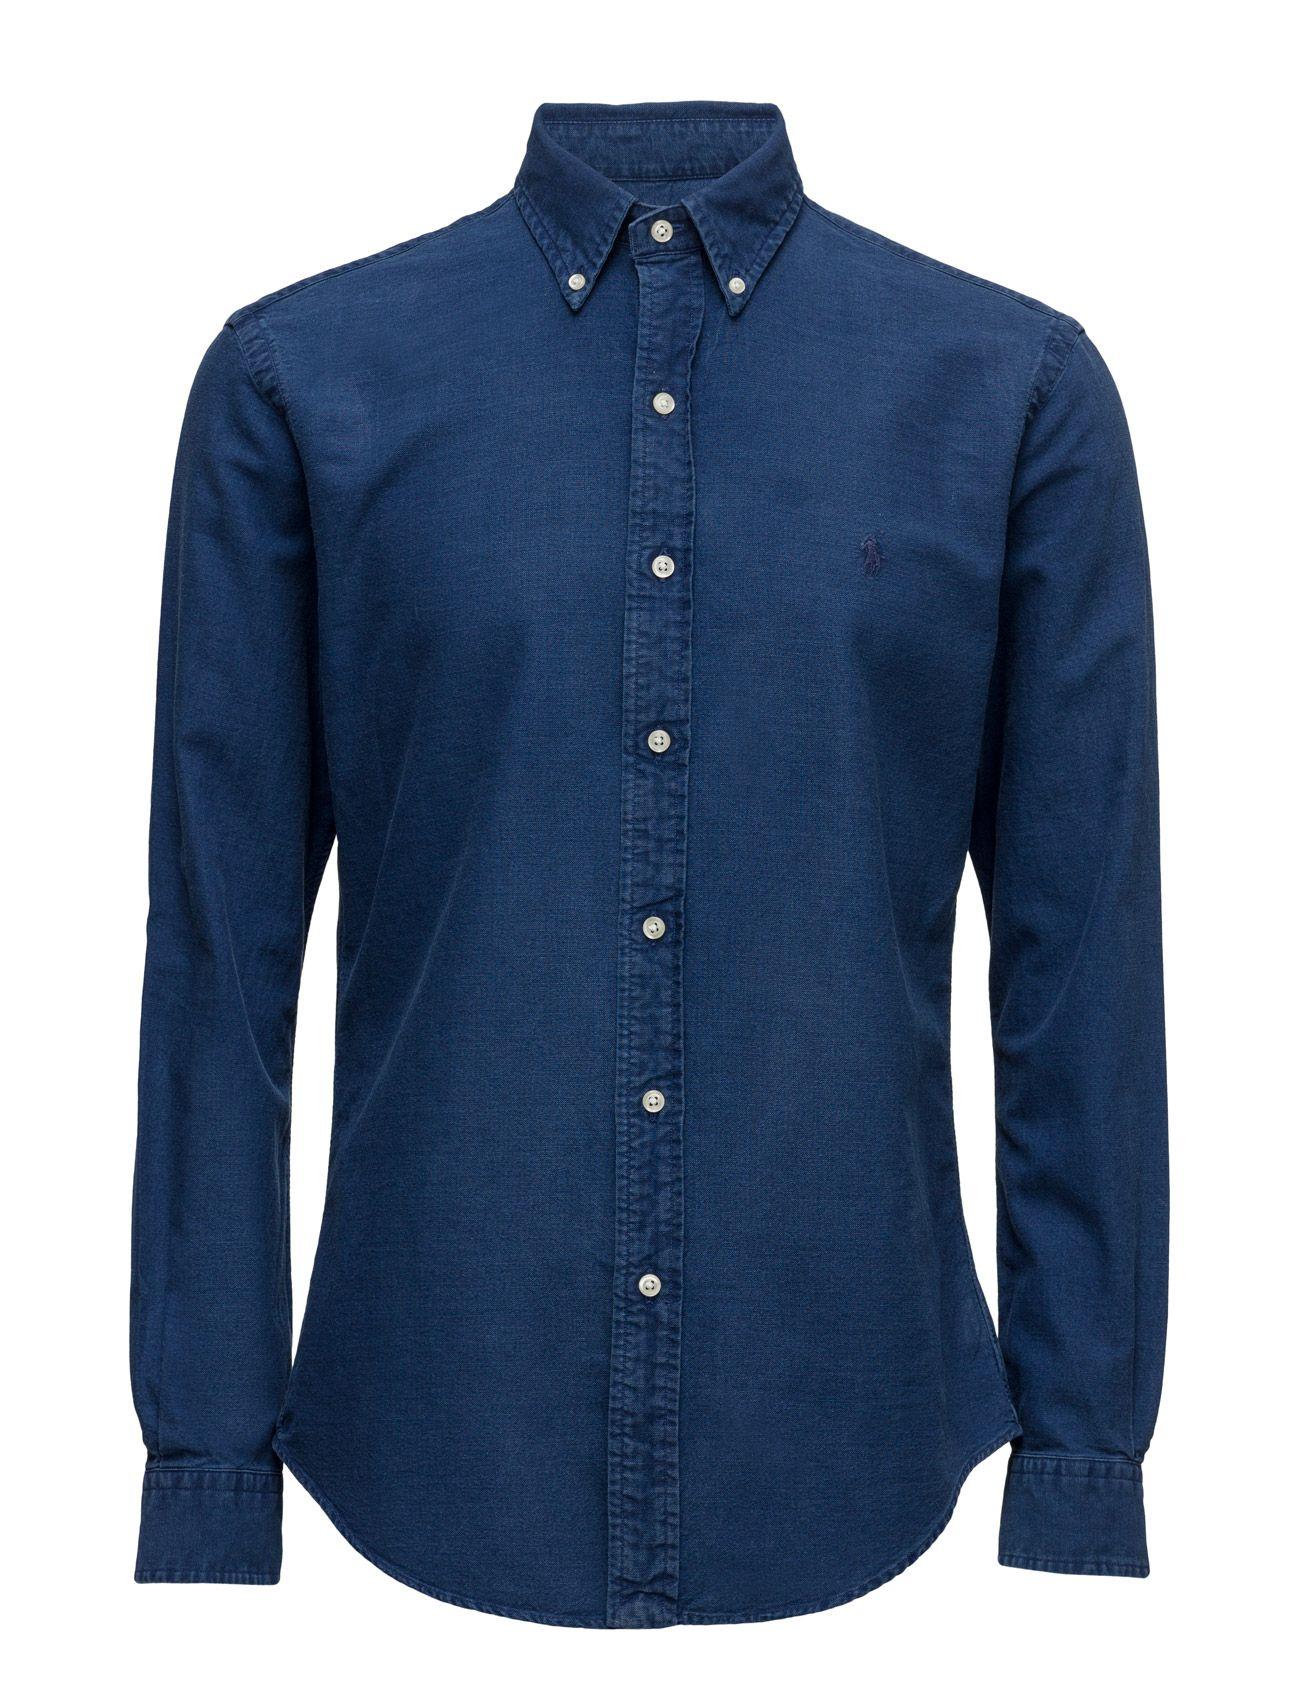 b000a27b27e New styles every day – shop now | Stuff | Shirts, Ralph lauren slim ...